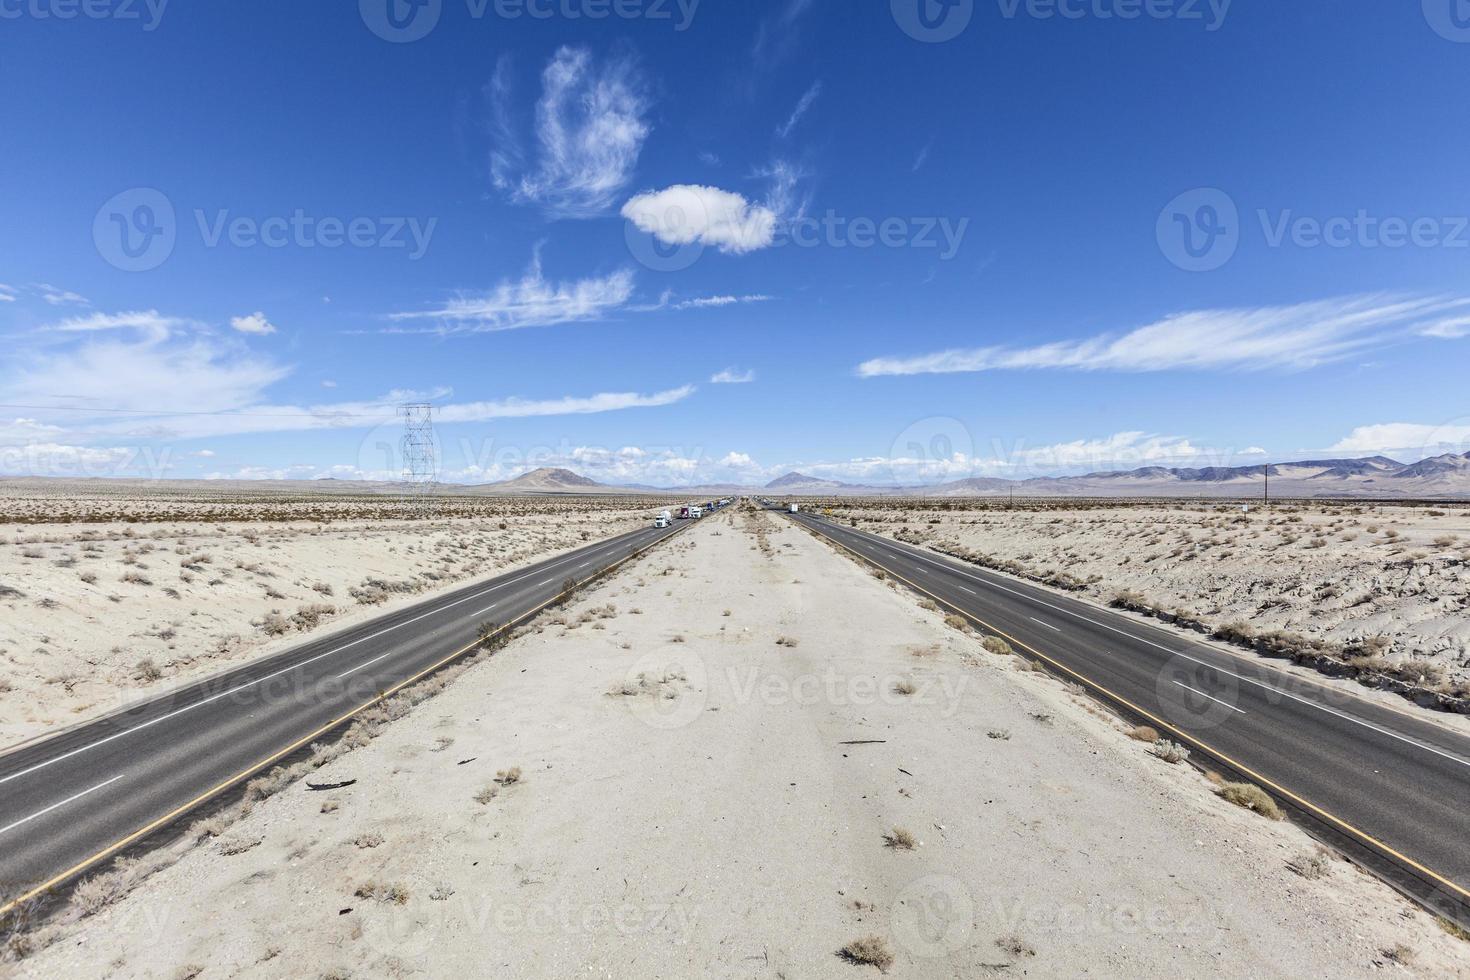 Interstate 15 between Los Angeles and Las Vegas photo